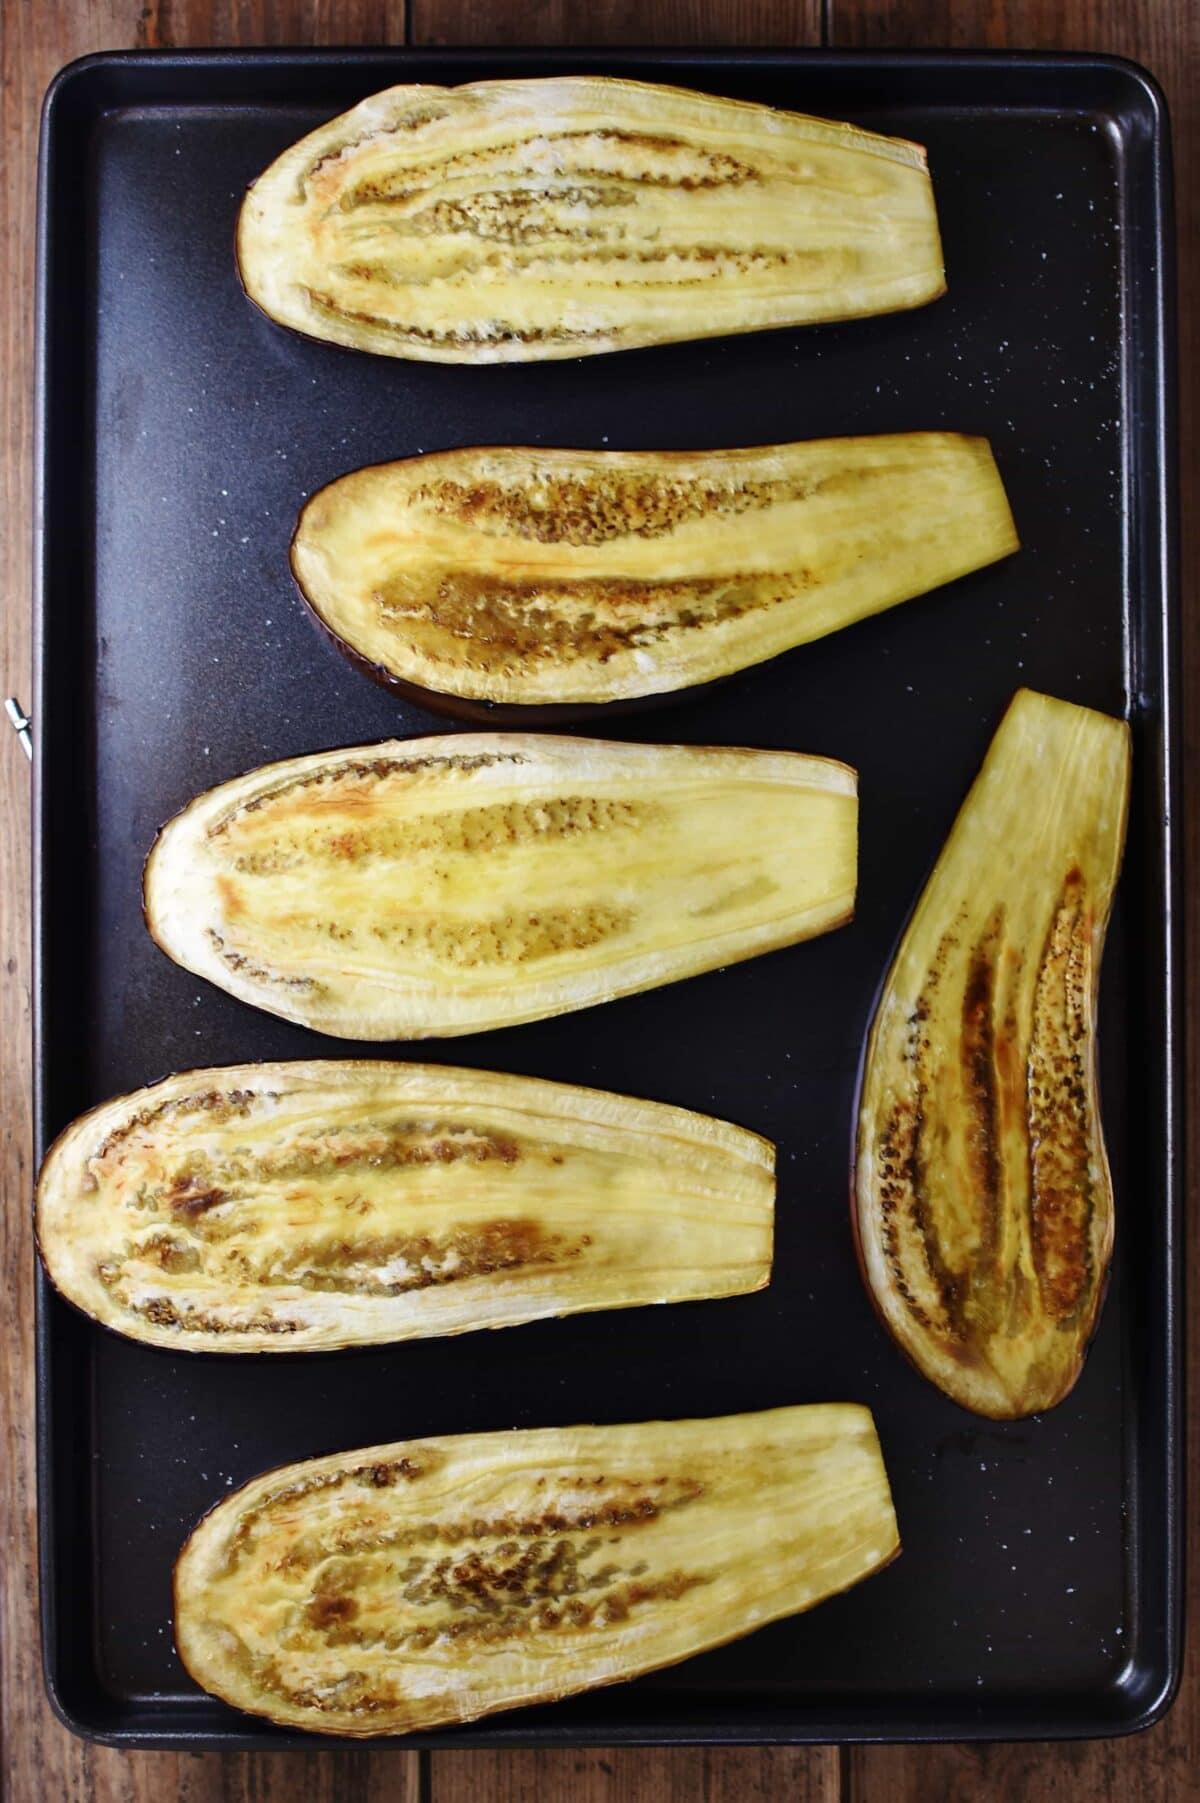 6 roasted eggplant halves on large oven sheet.